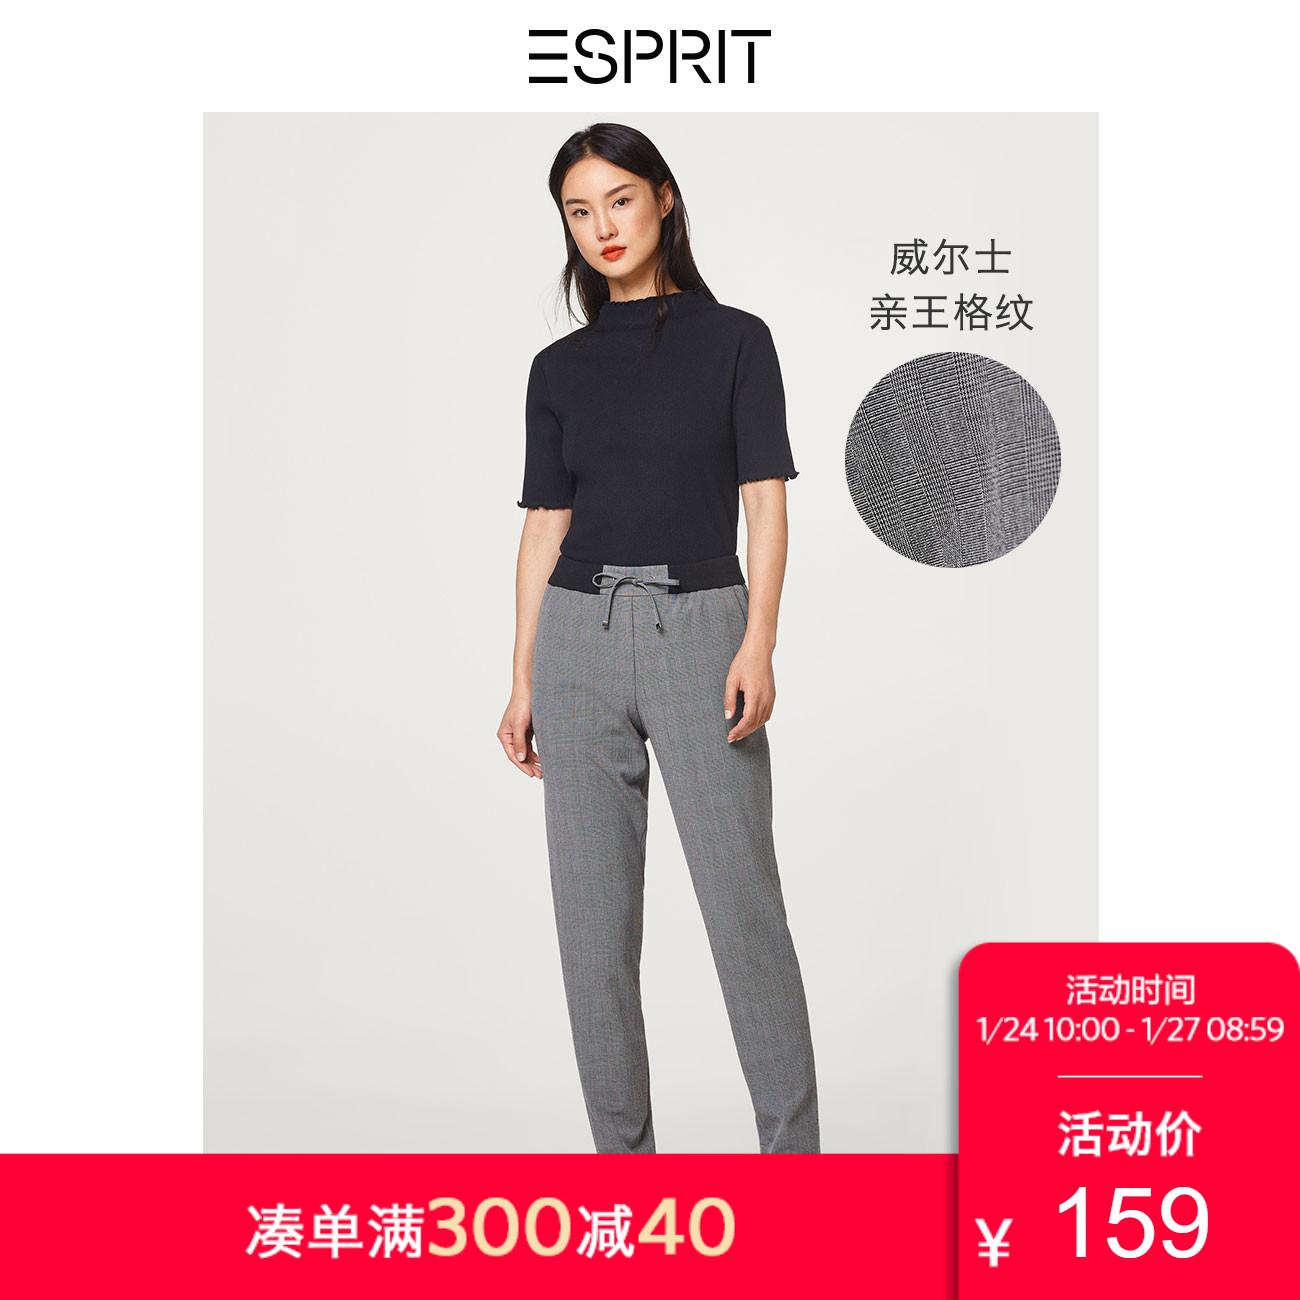 ESPRIT 女装秋格子条纹铅笔裤格纹时尚收腰休闲裤-088EE1B014